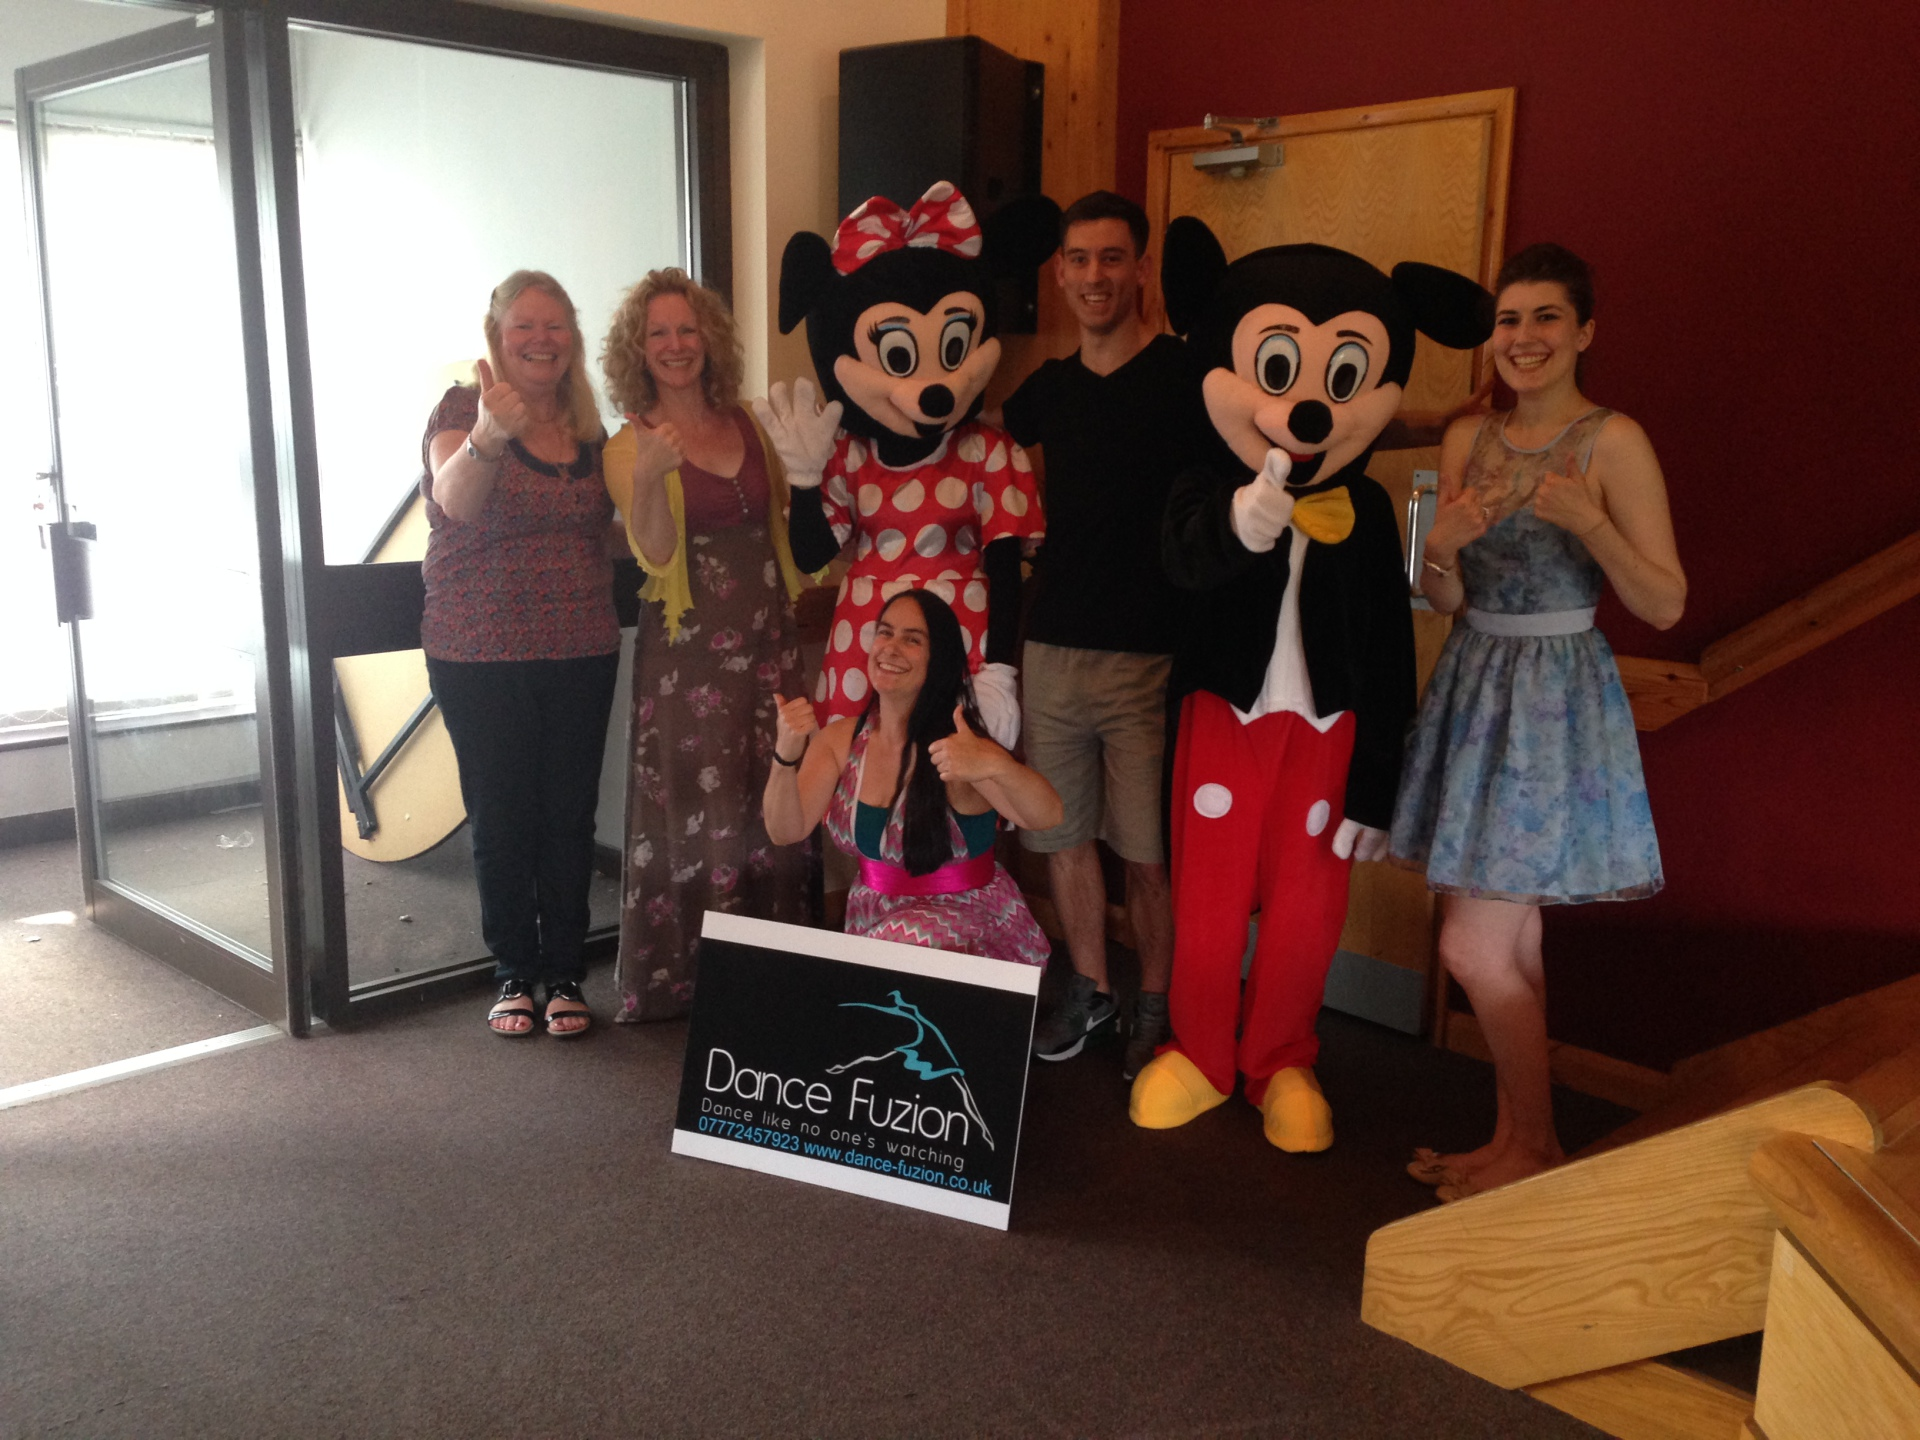 Presentation with Mickey and Minnie